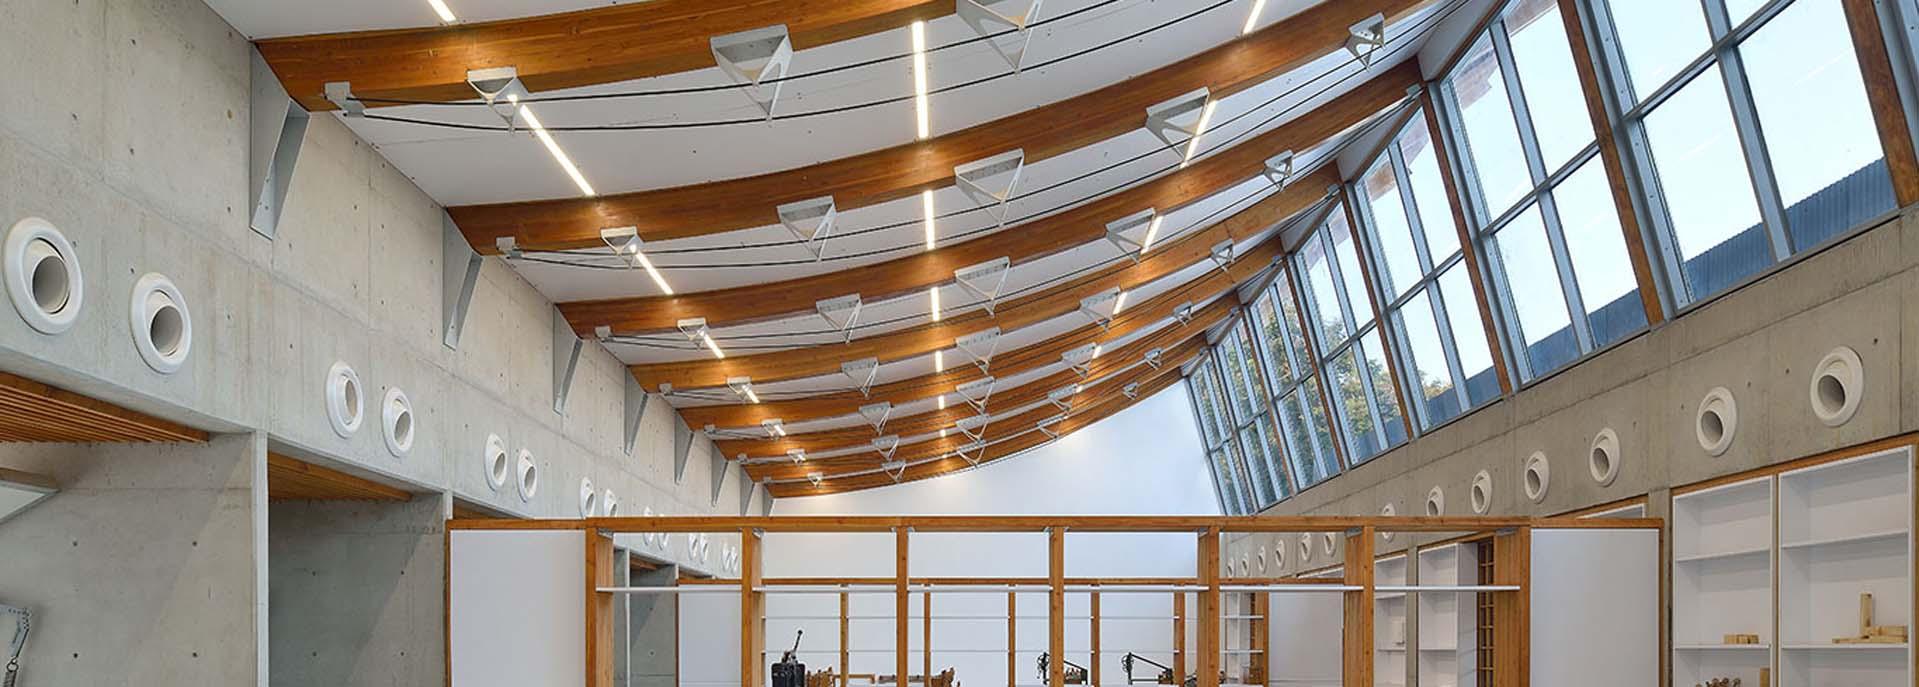 Douglas Fir False Ceiling | Canadian Wood